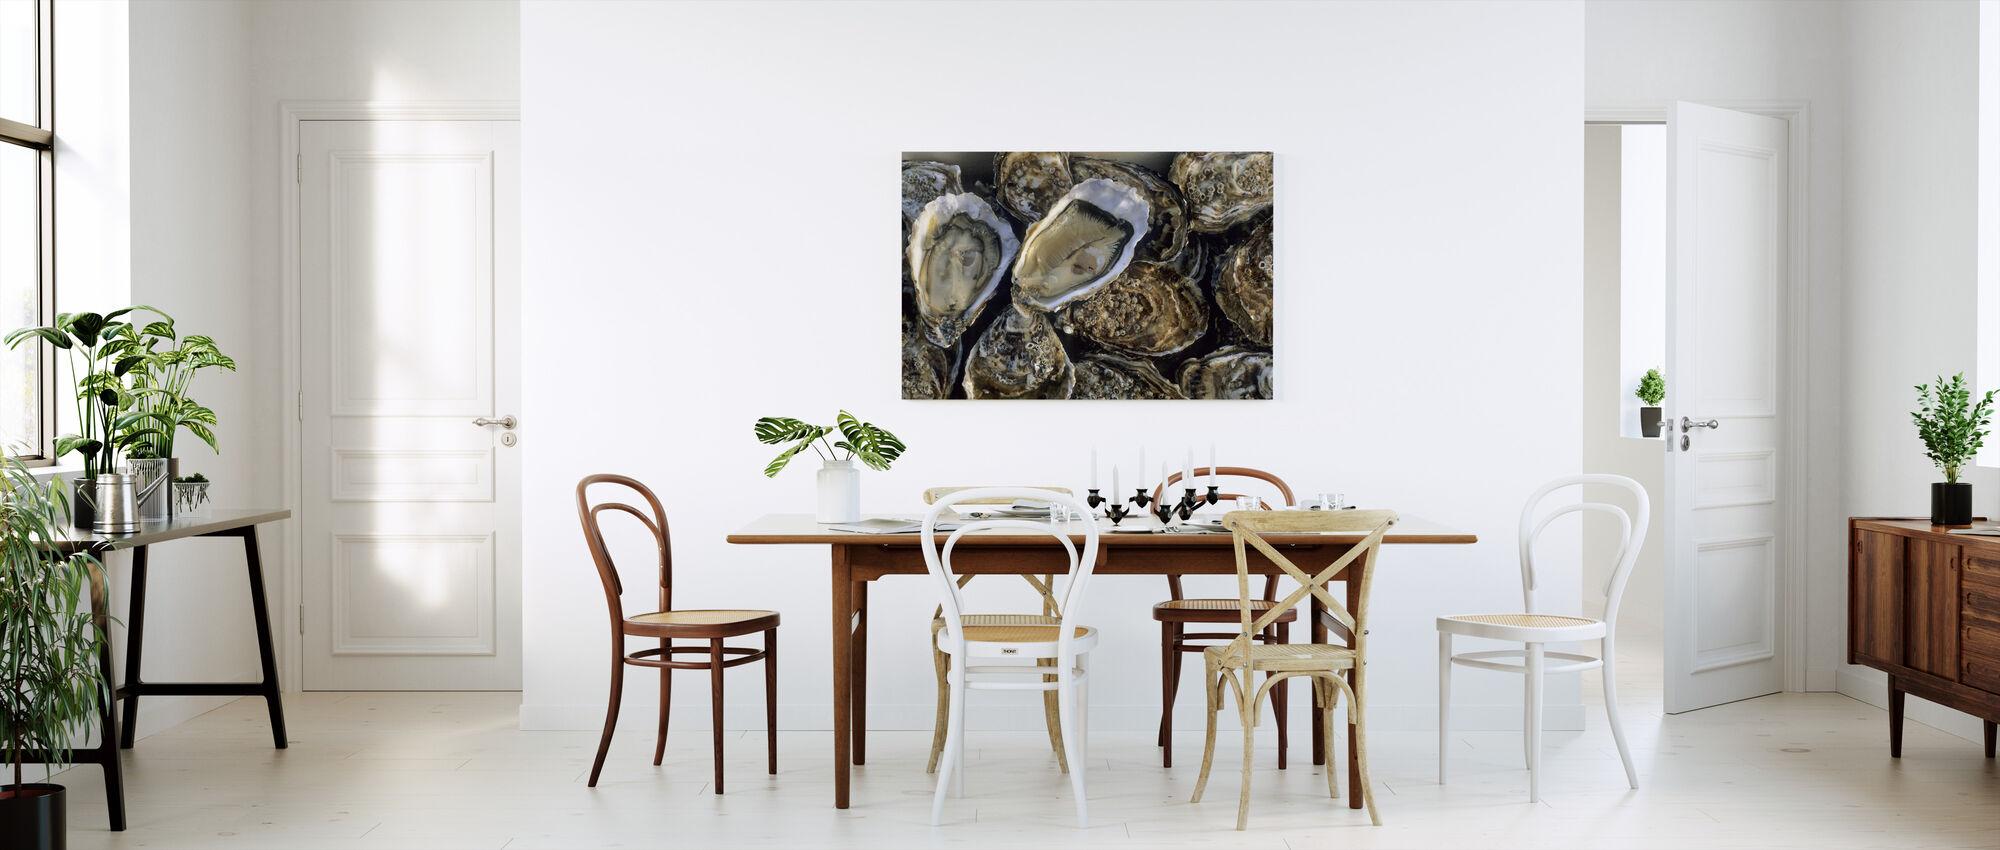 Oesters - Canvas print - Keuken